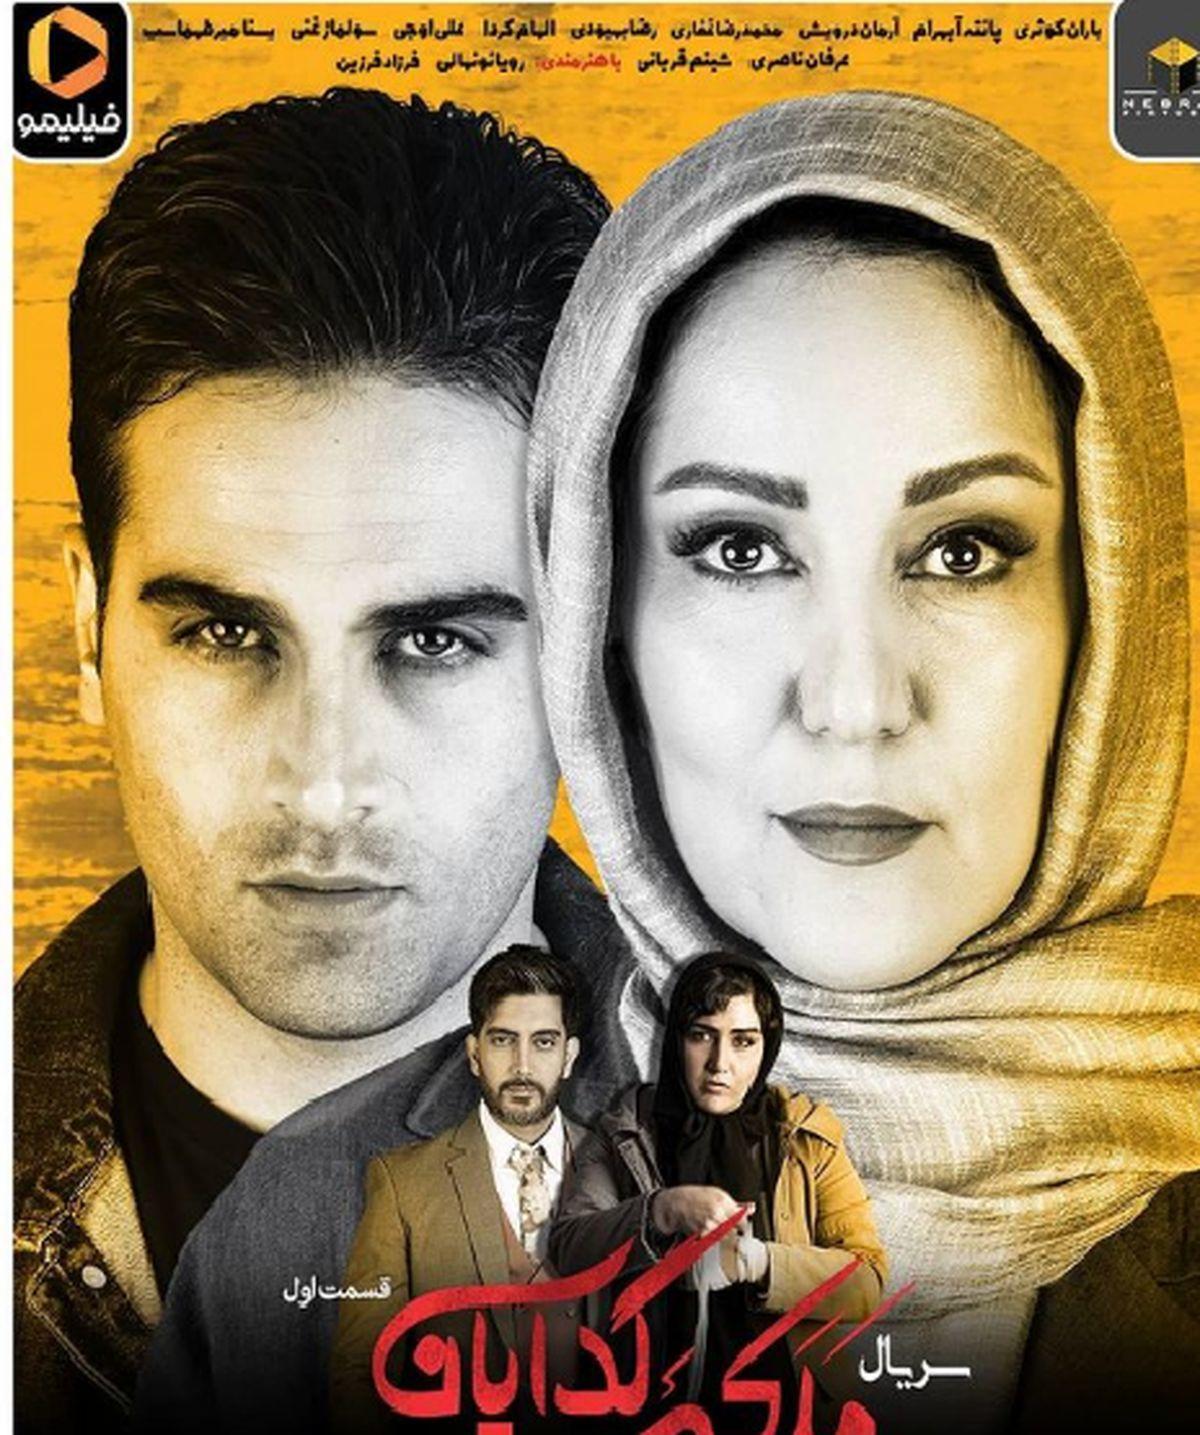 سریال ملکه گدایان/ پوستر جدید باران کوثری در ملکه گدایان